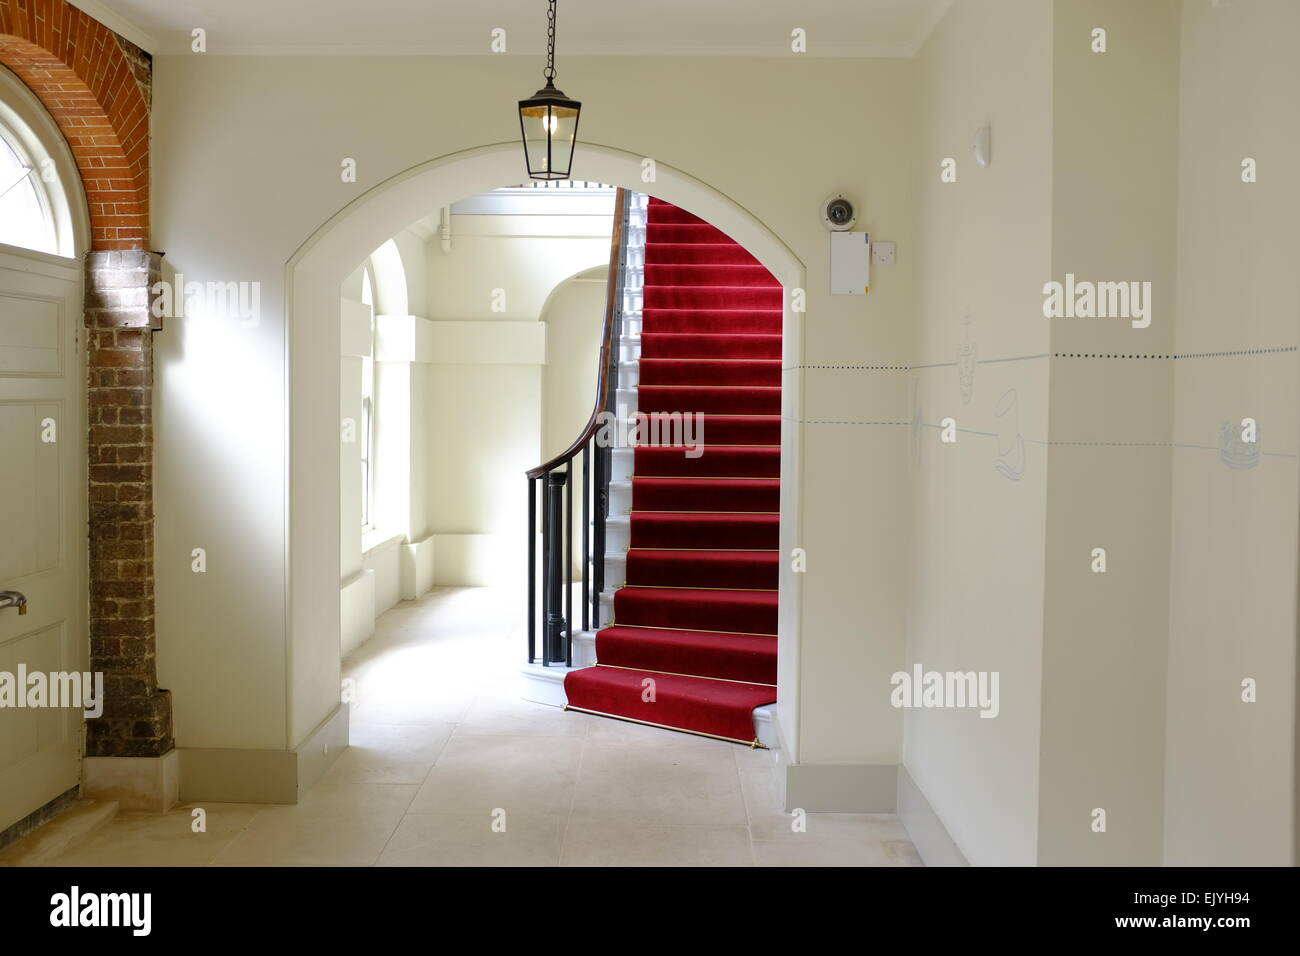 Kensington palace interior london england stock photo for Interno kensington palace